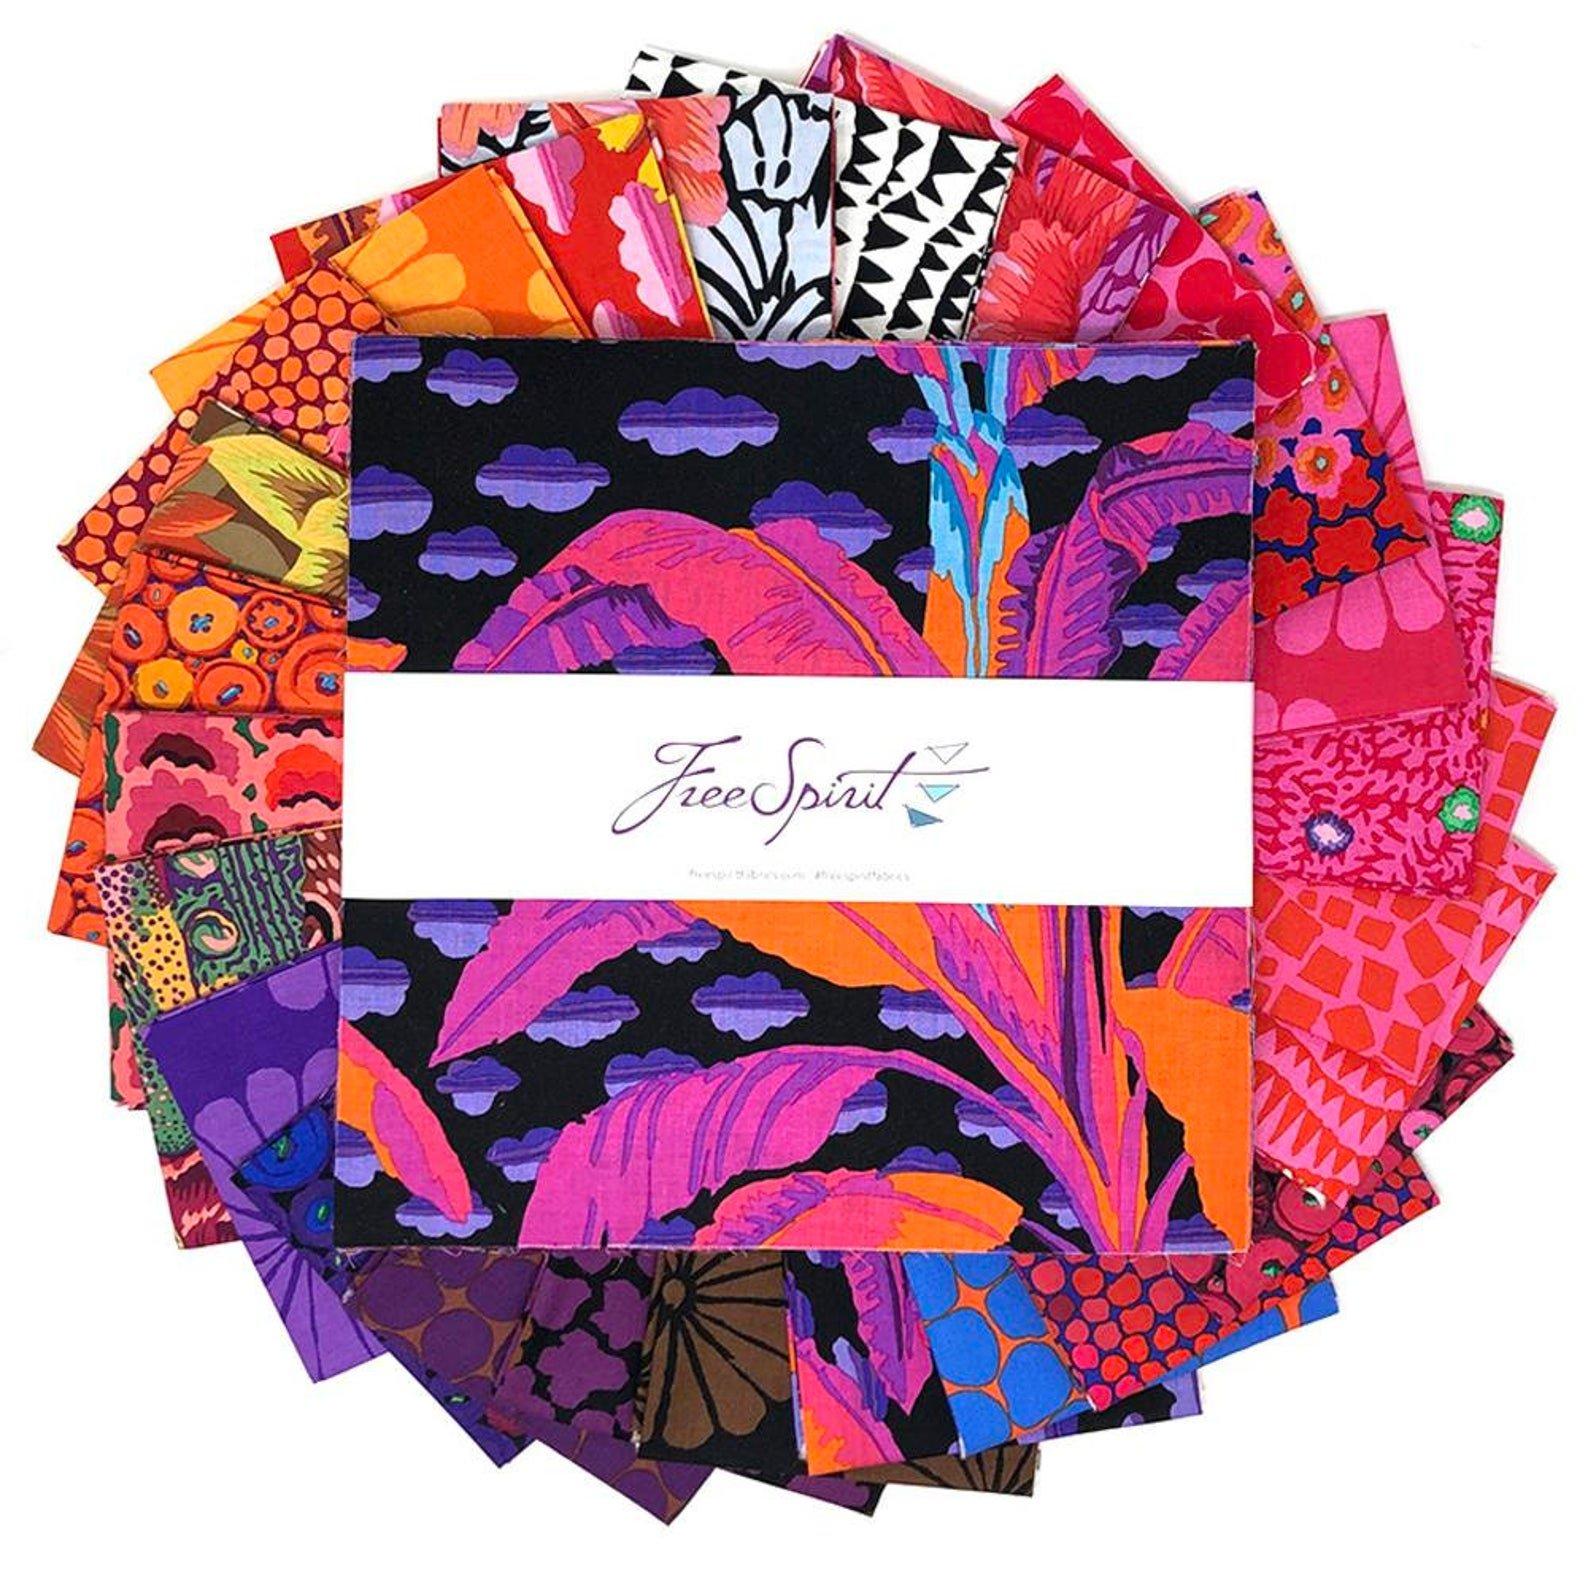 February 2021 - Hot Layer Cake 42pc/bundle - By Kaffe Fassett Collective For Free Spirit Fabrics